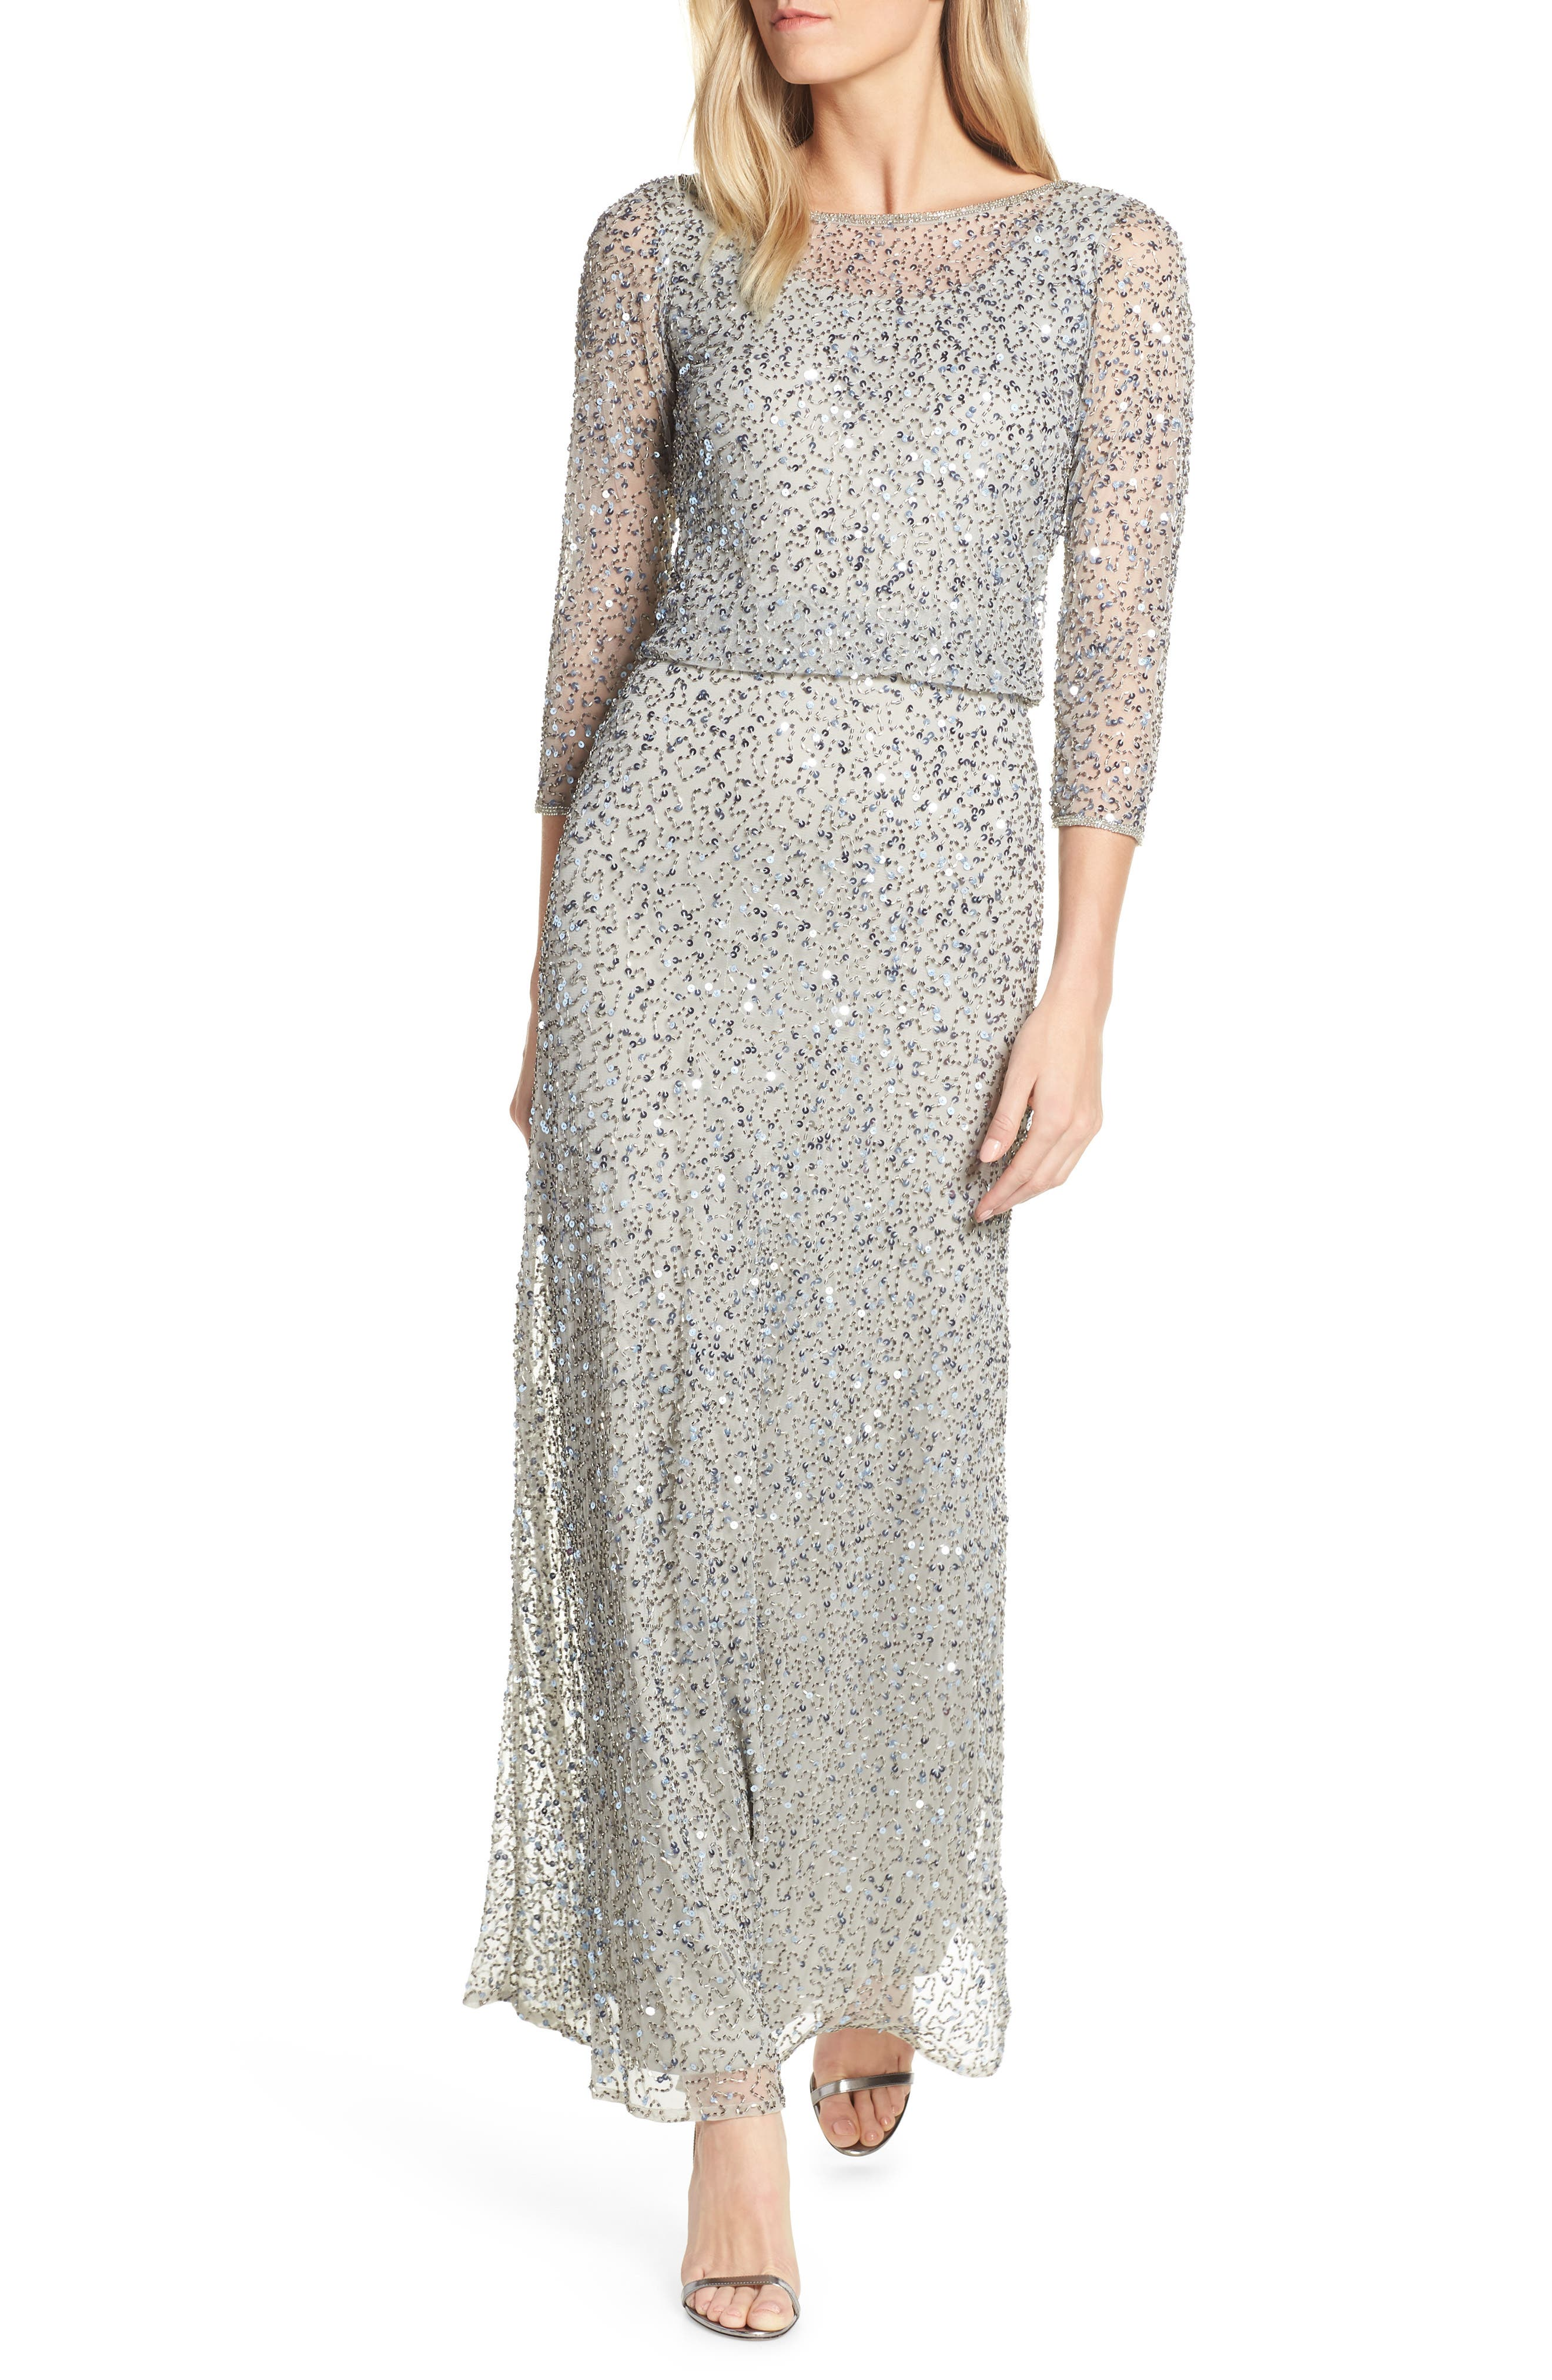 Plus Size Pisarro Nights Embellished Blouson Evening Dress, Metallic